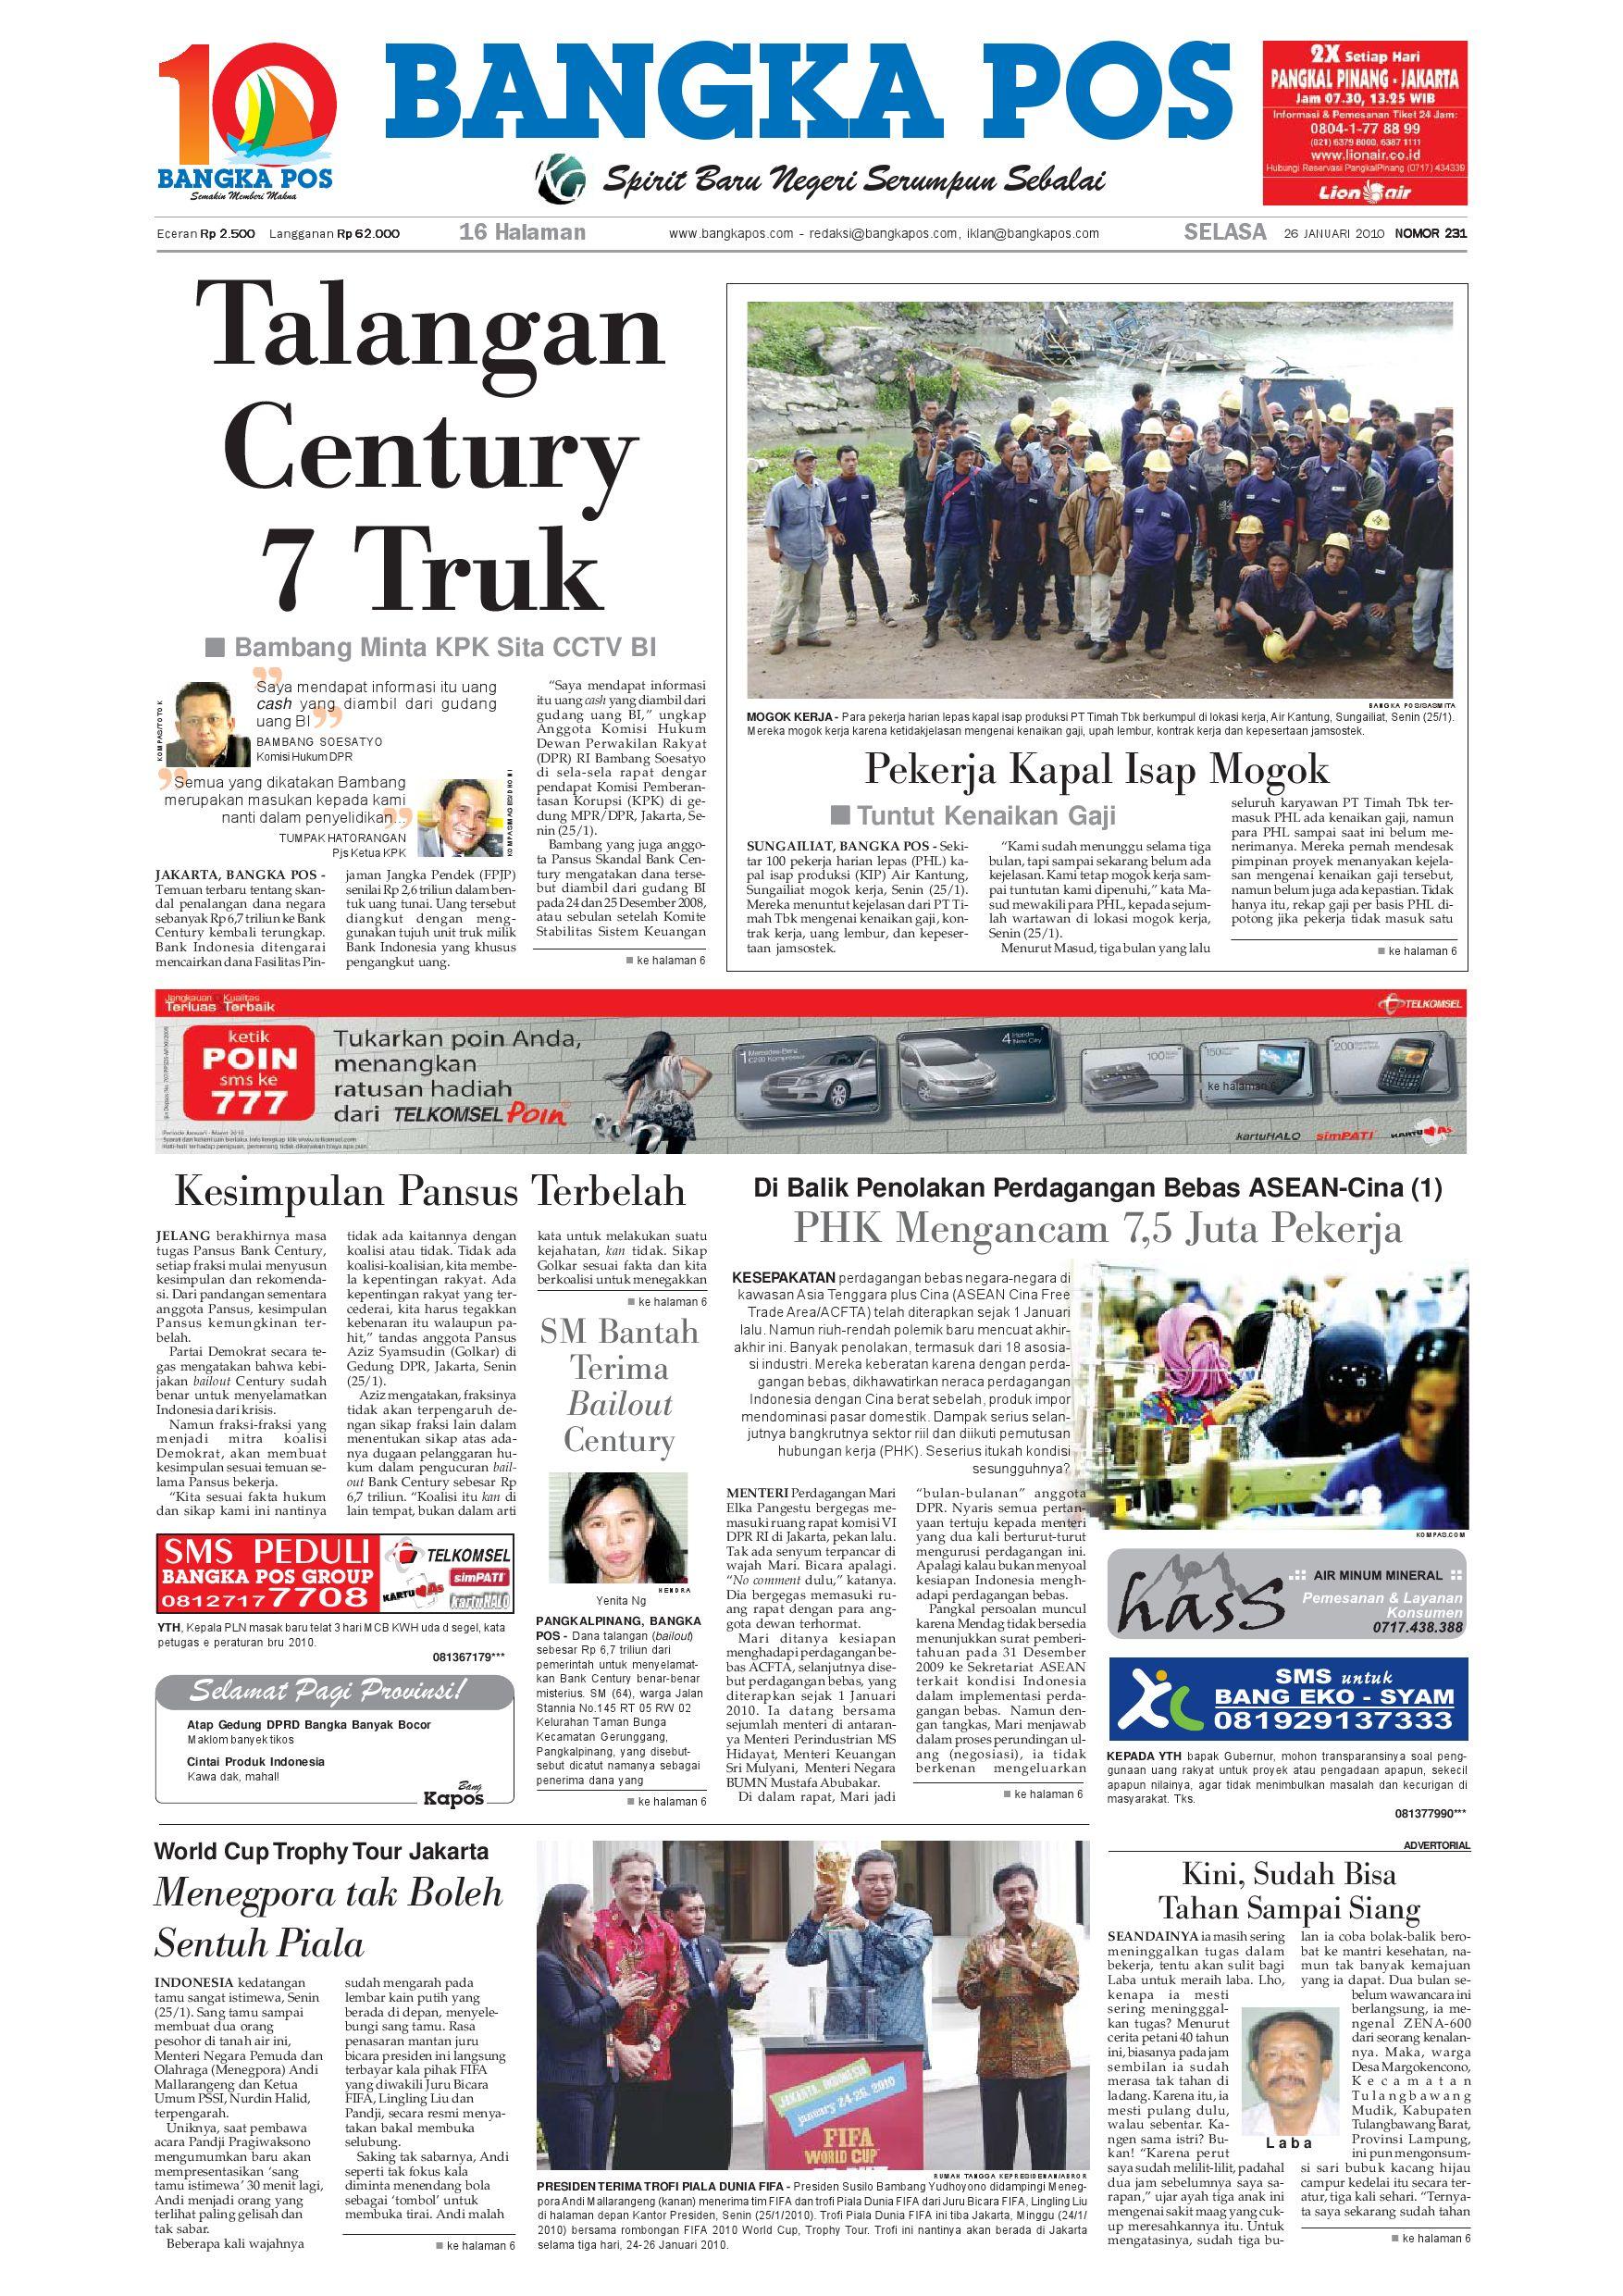 Harian Pagi Bangka Pos Edisi 26 Januari 2010 By Issuu Produk Ukm Bumn Jamu Kunyit Asam Seger Waras